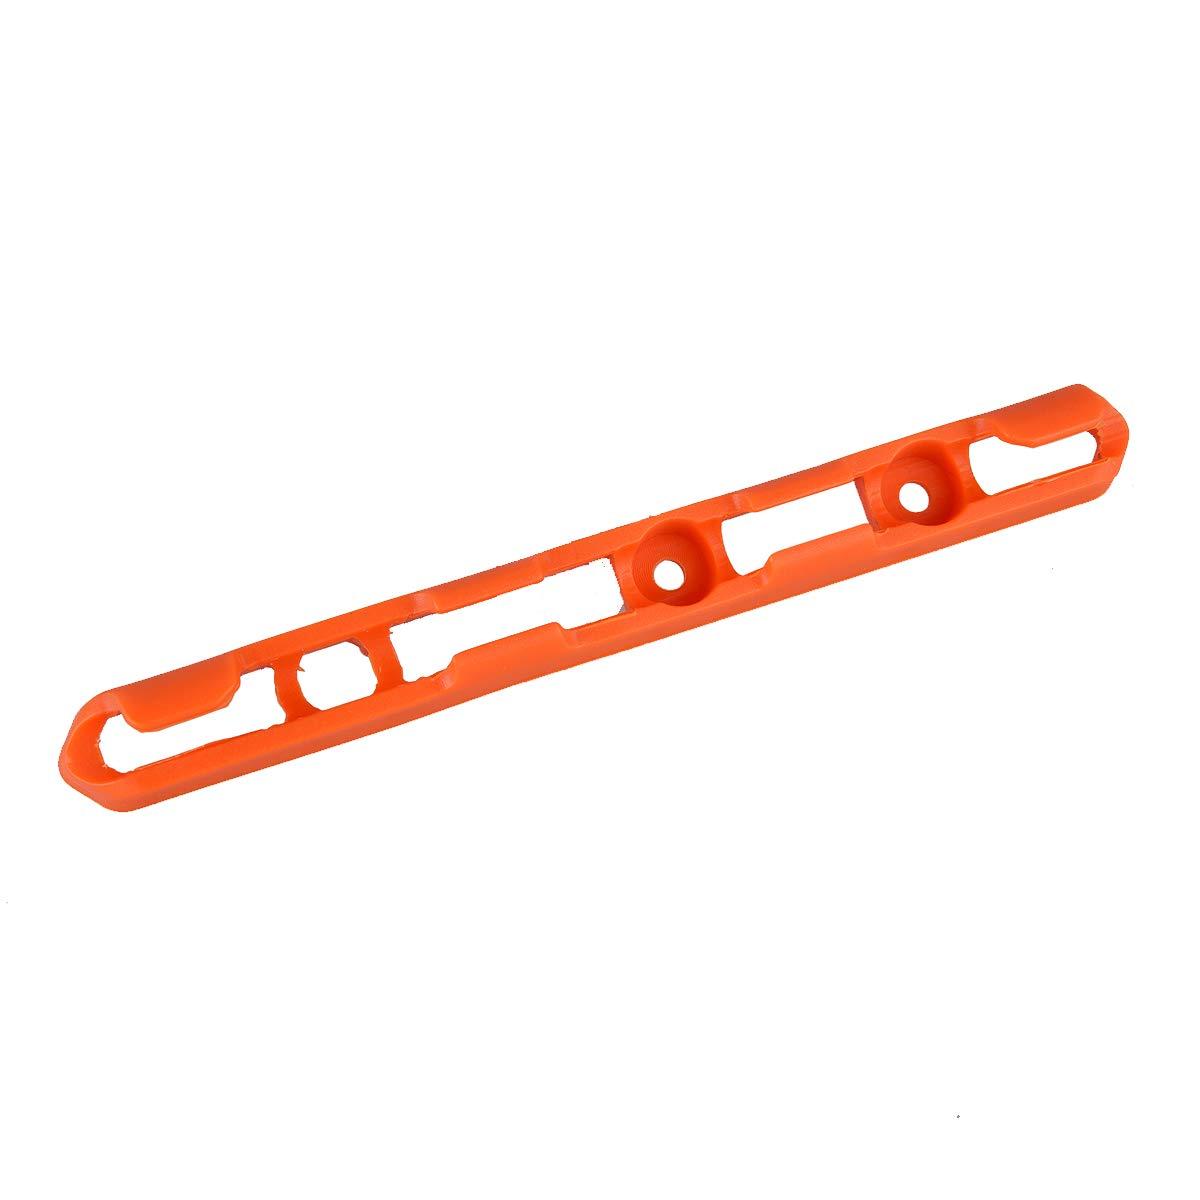 PRO CAKEN Brake Line Wire Cable Hose Clamp Holder for SX125 SX150 SXF250 XCF250 SXF350 XCF350 SX450 SXF XC DirtBikeClub